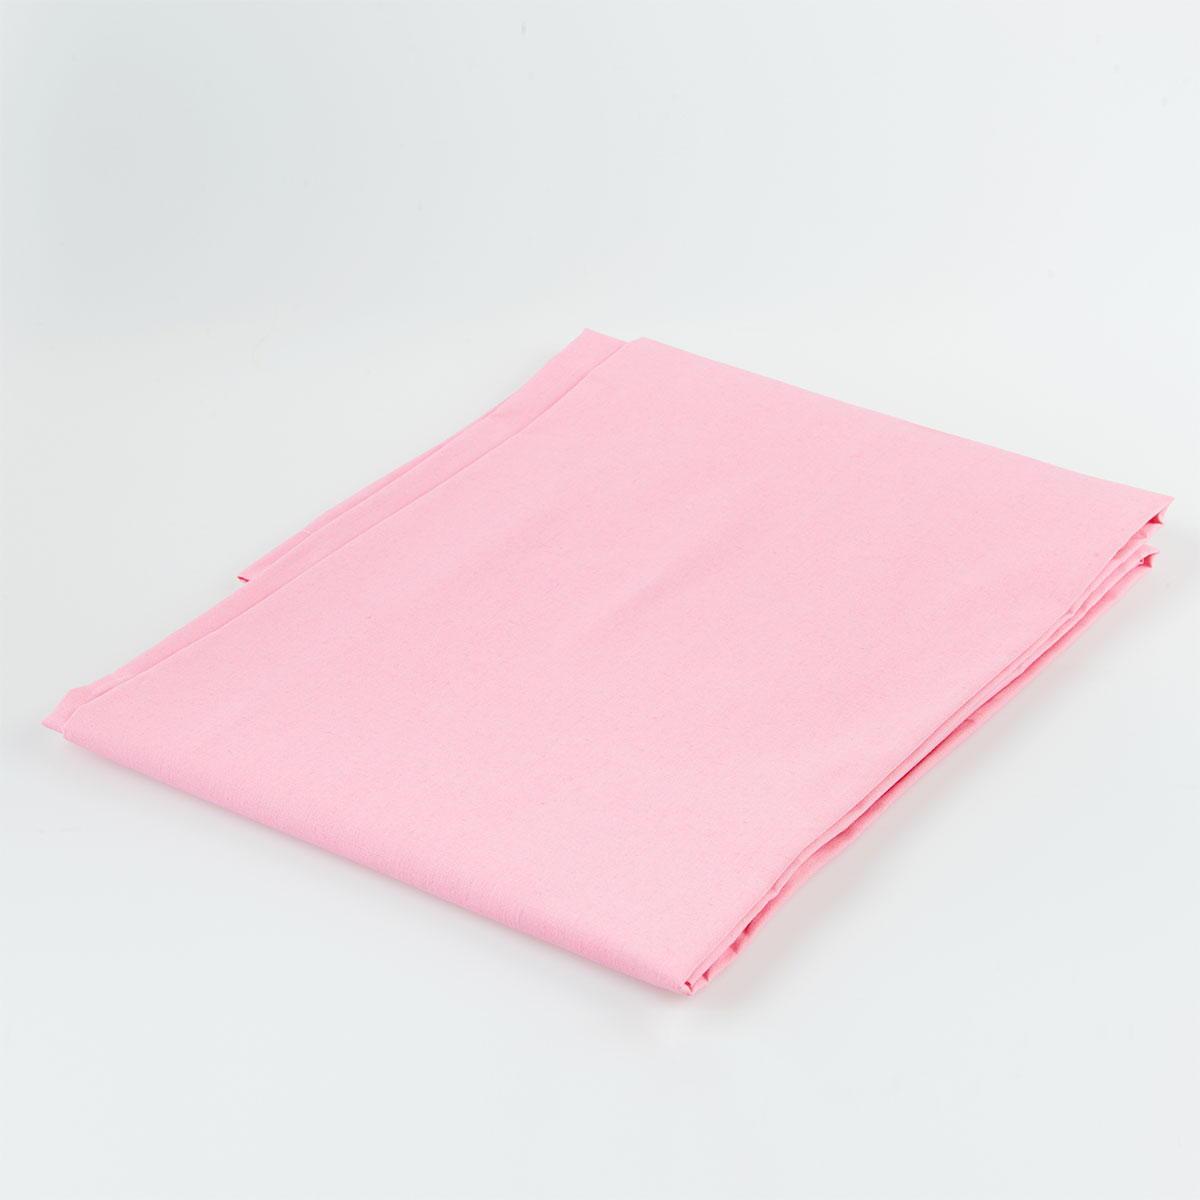 drap pcnc standard textile. Black Bedroom Furniture Sets. Home Design Ideas